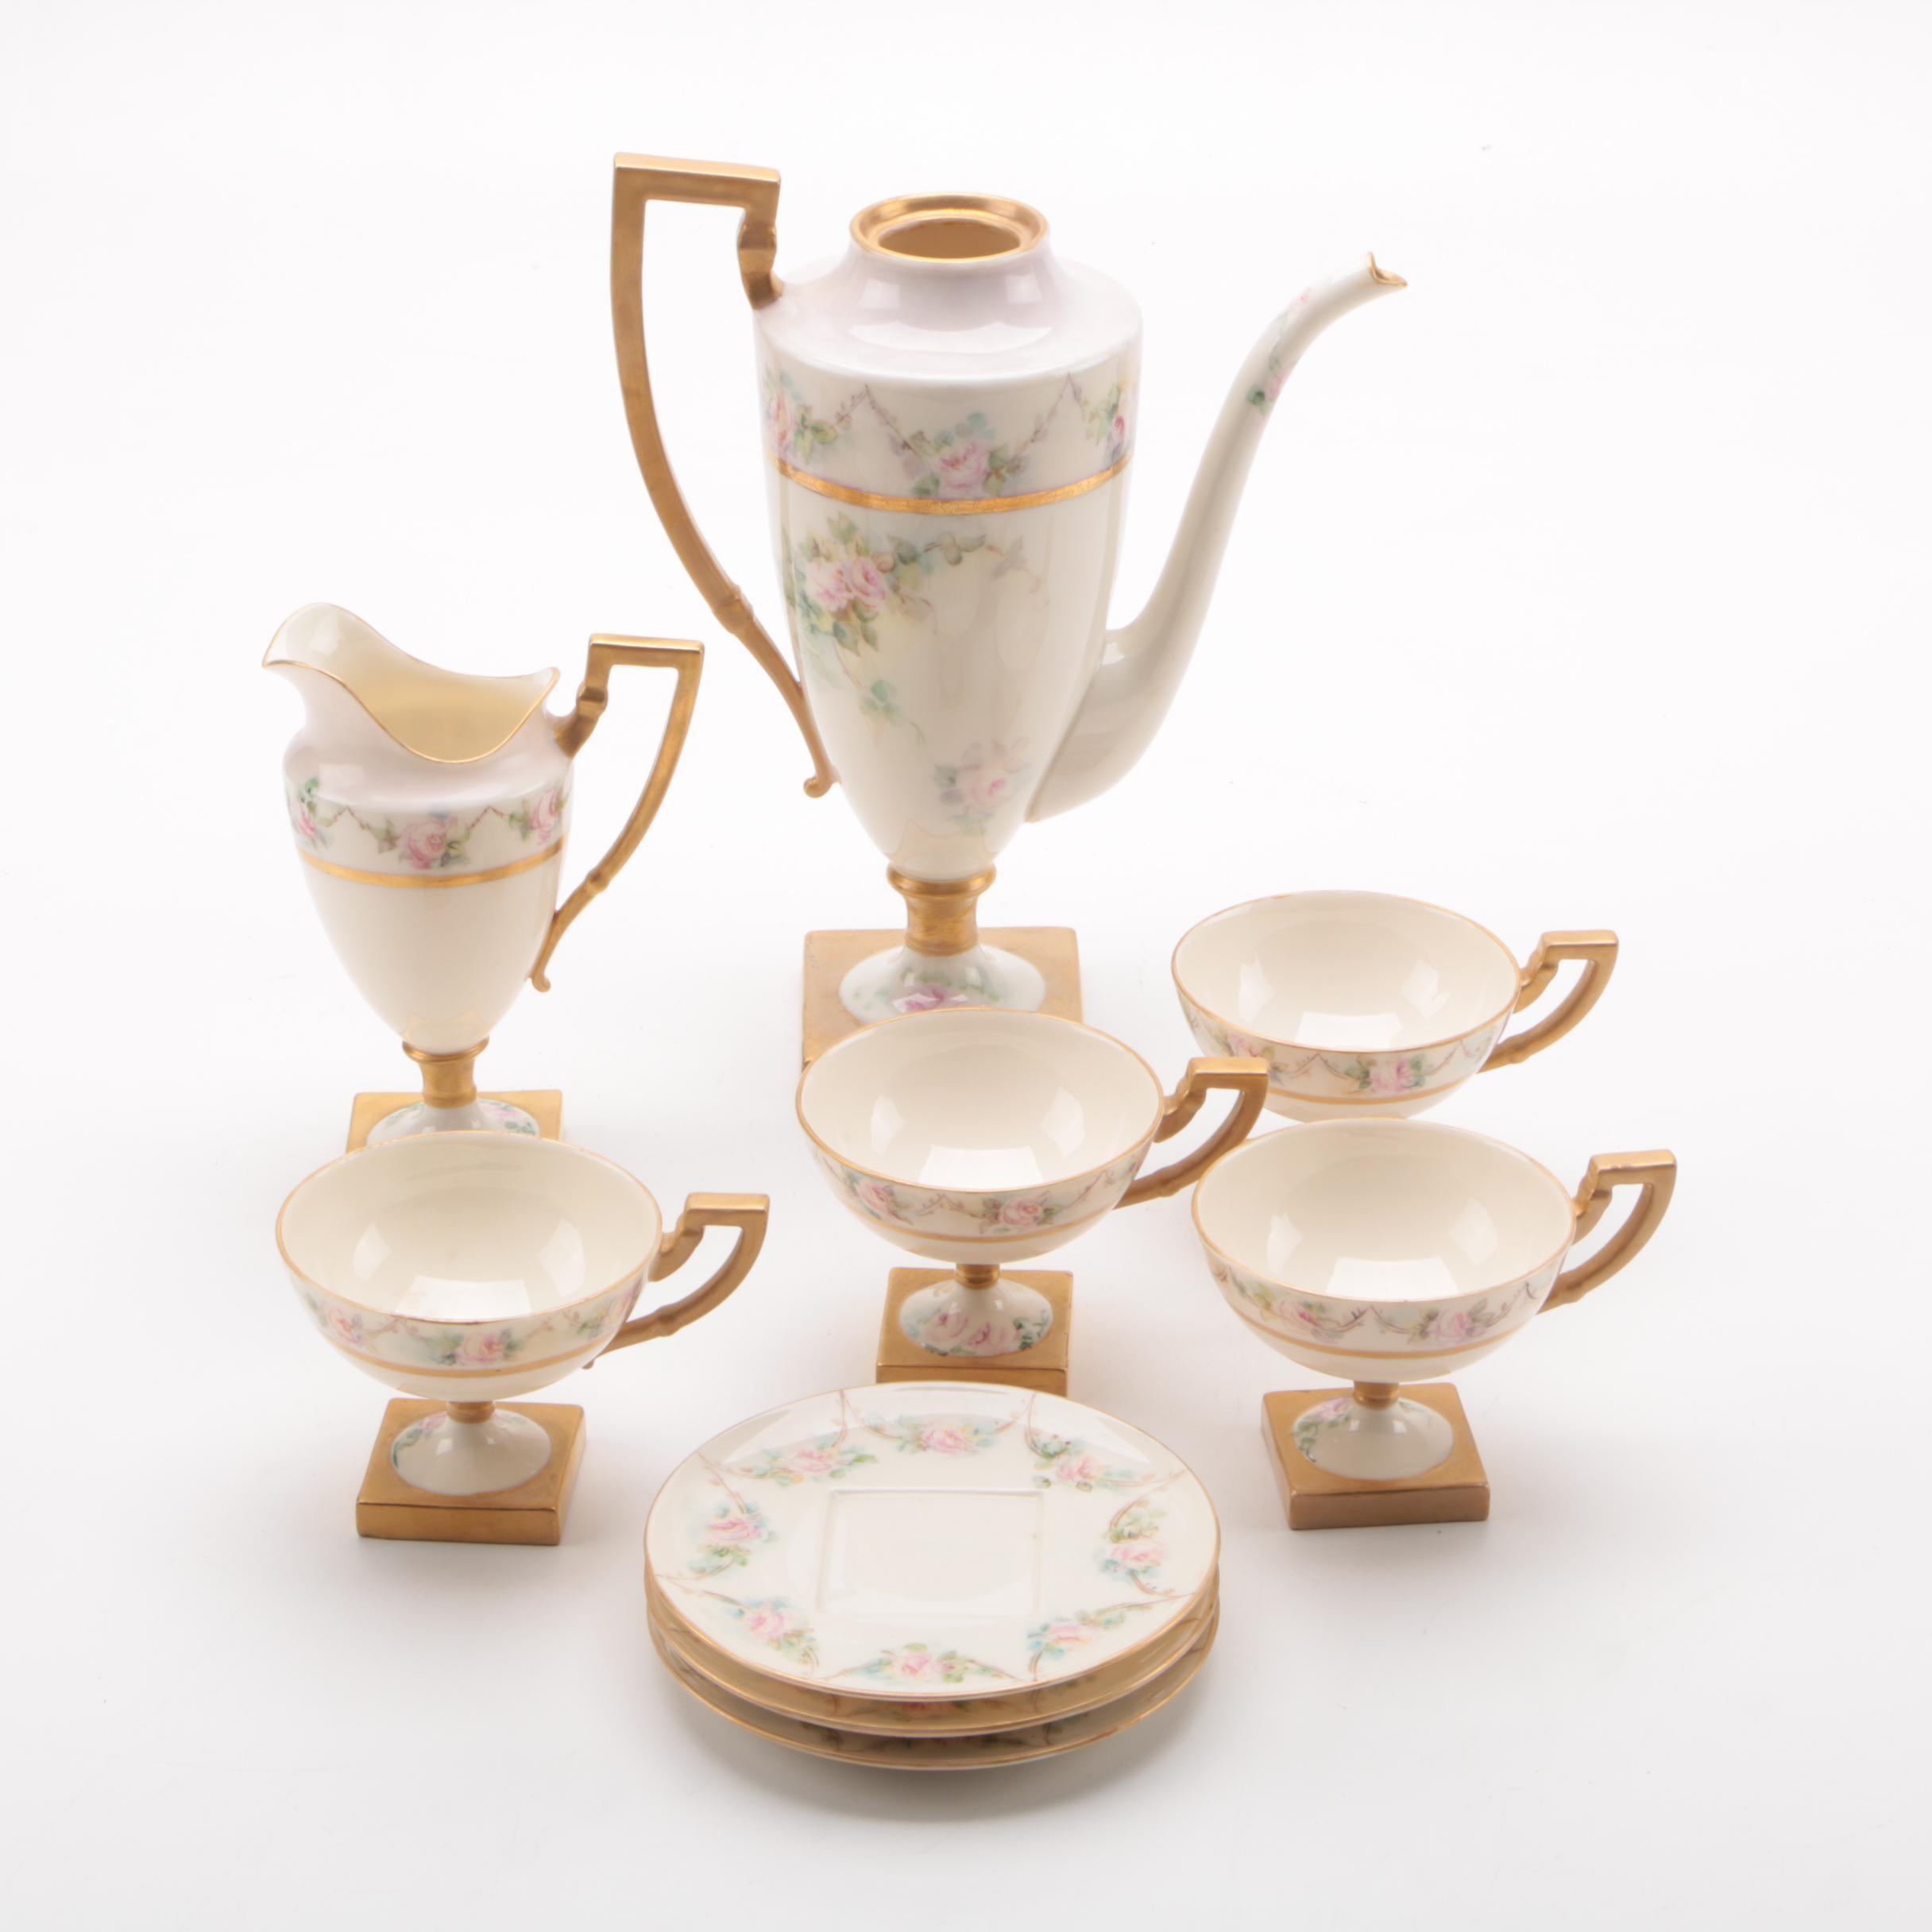 Antique American Belleek Coffee Service 1889-94